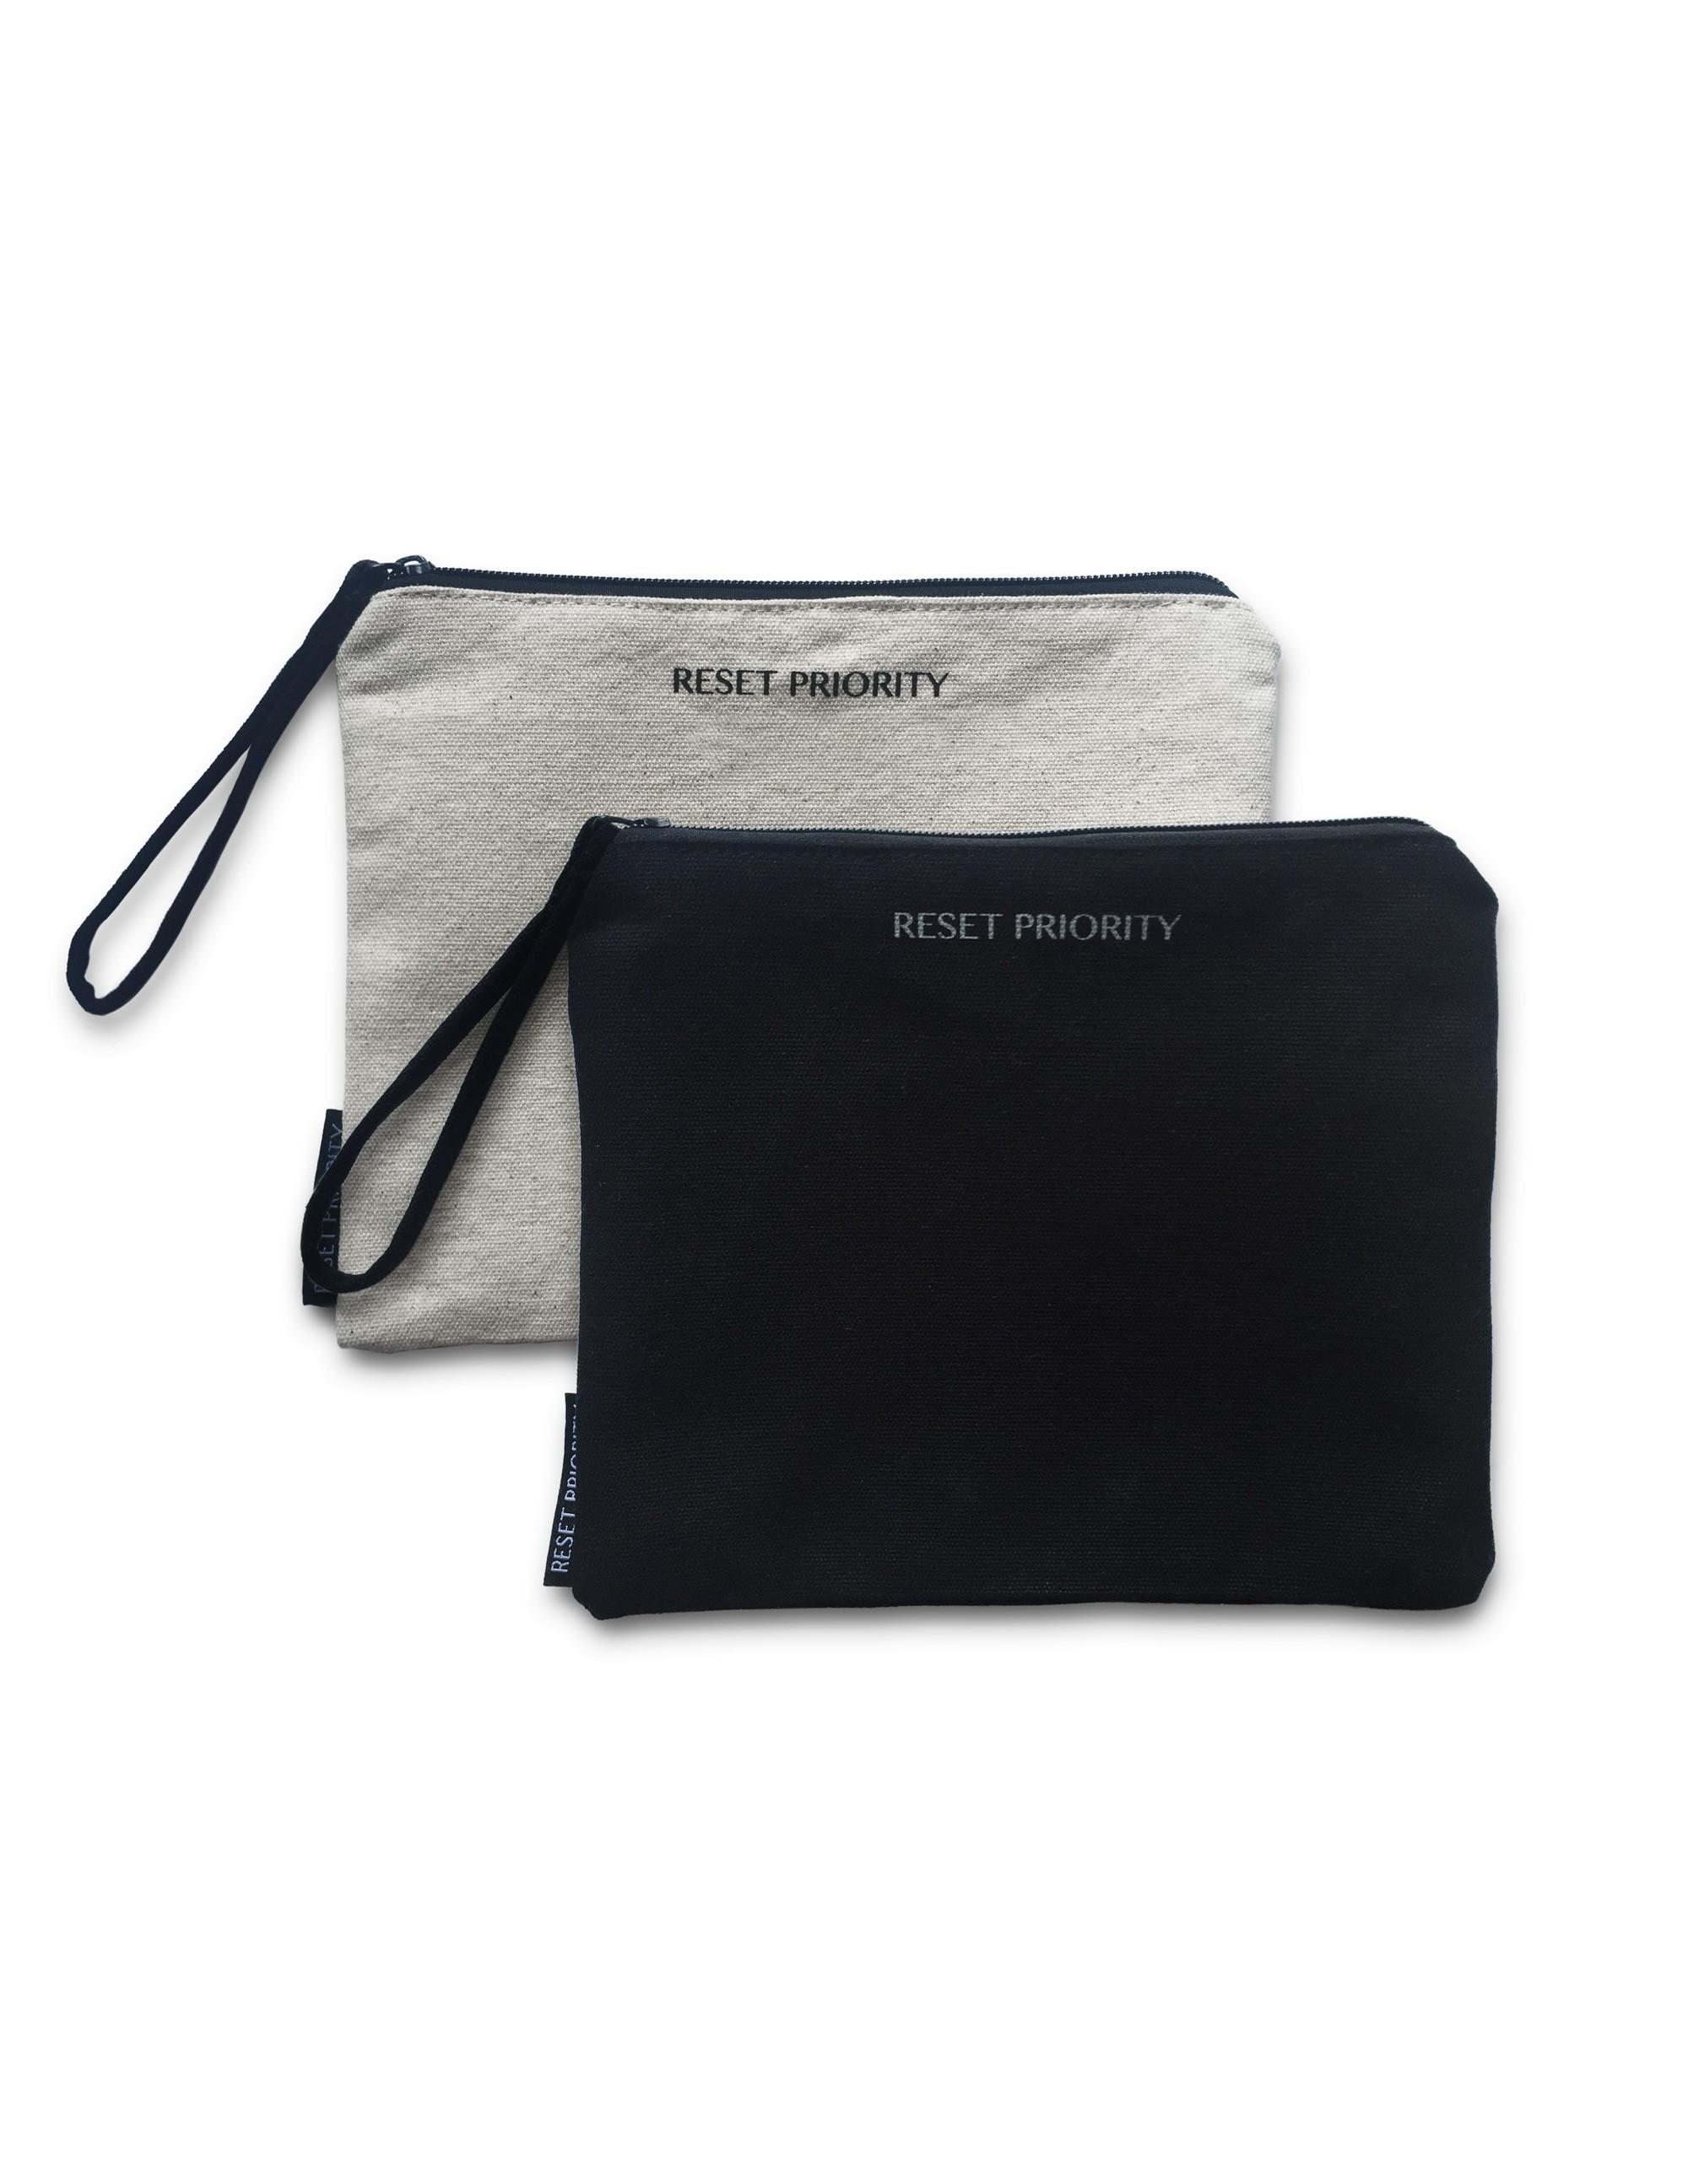 BIKINI Bag - Black